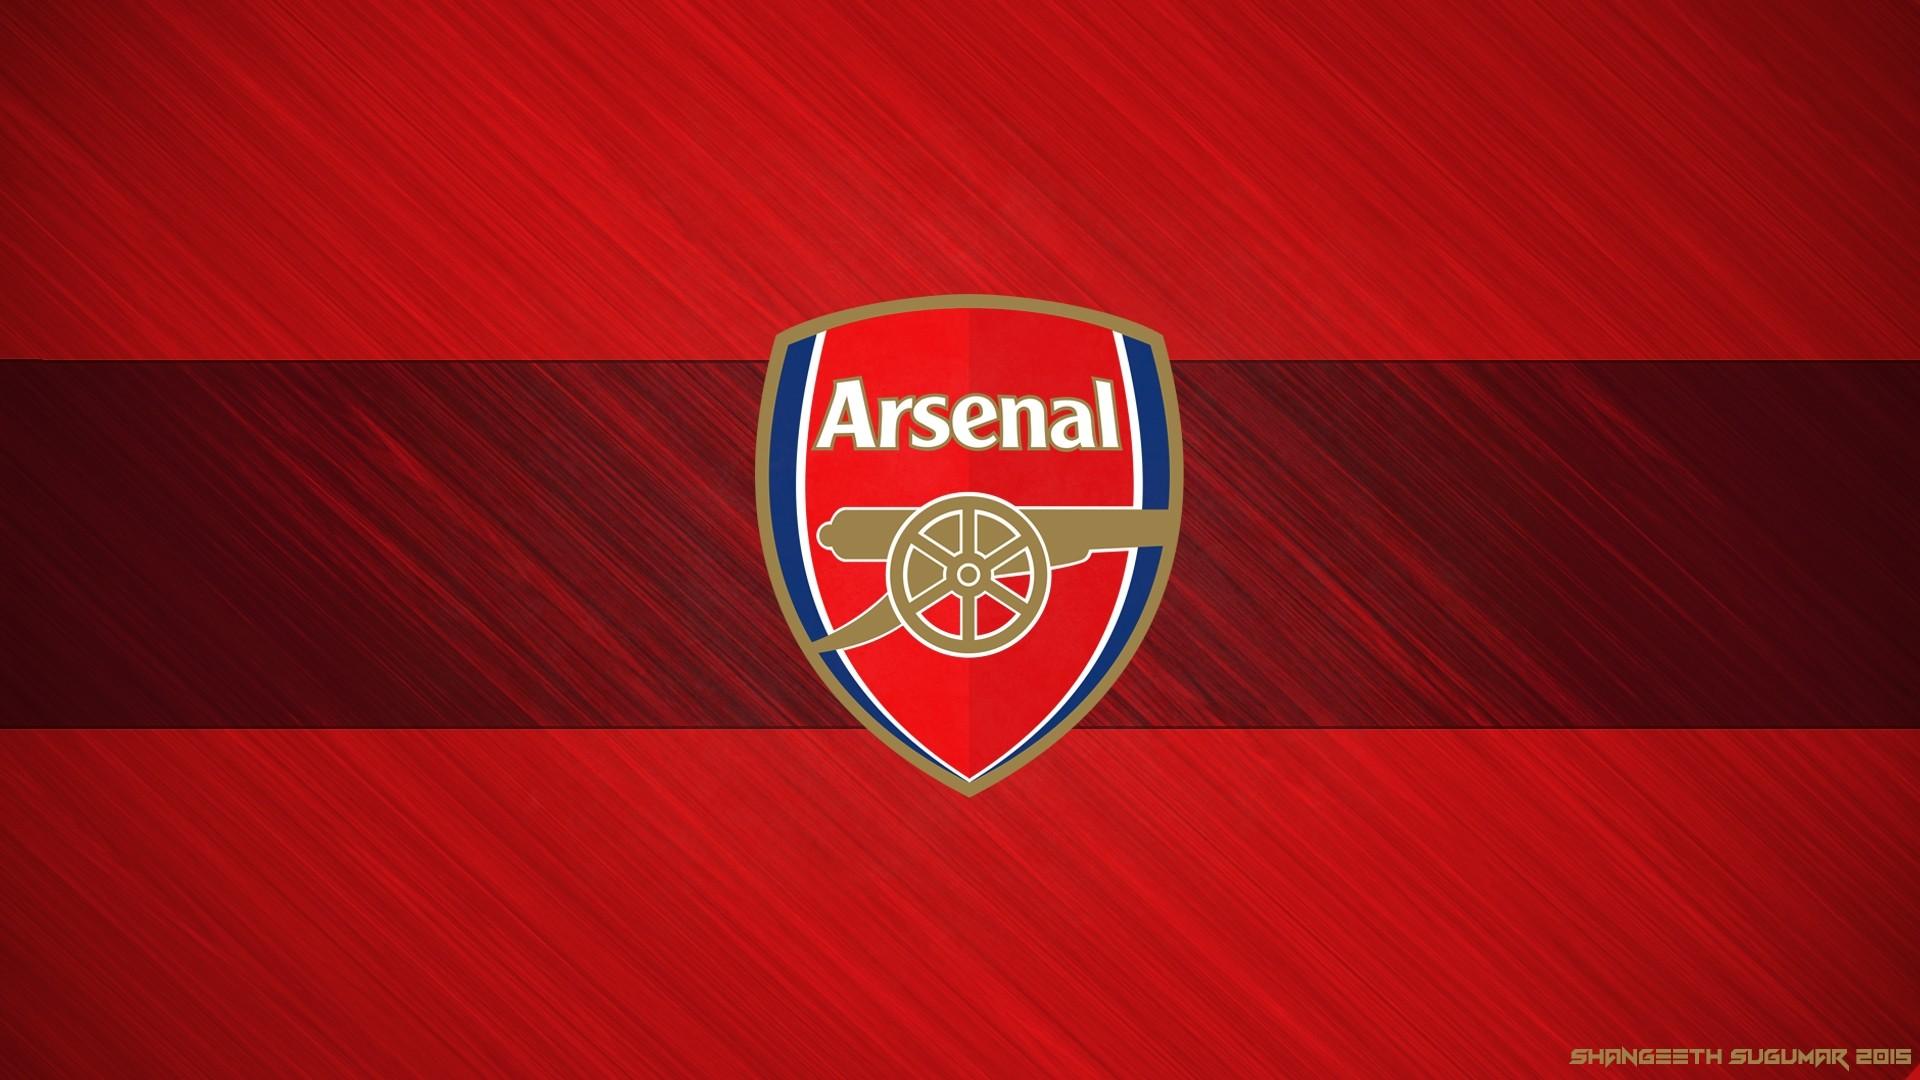 Arsenal computer wallpaper